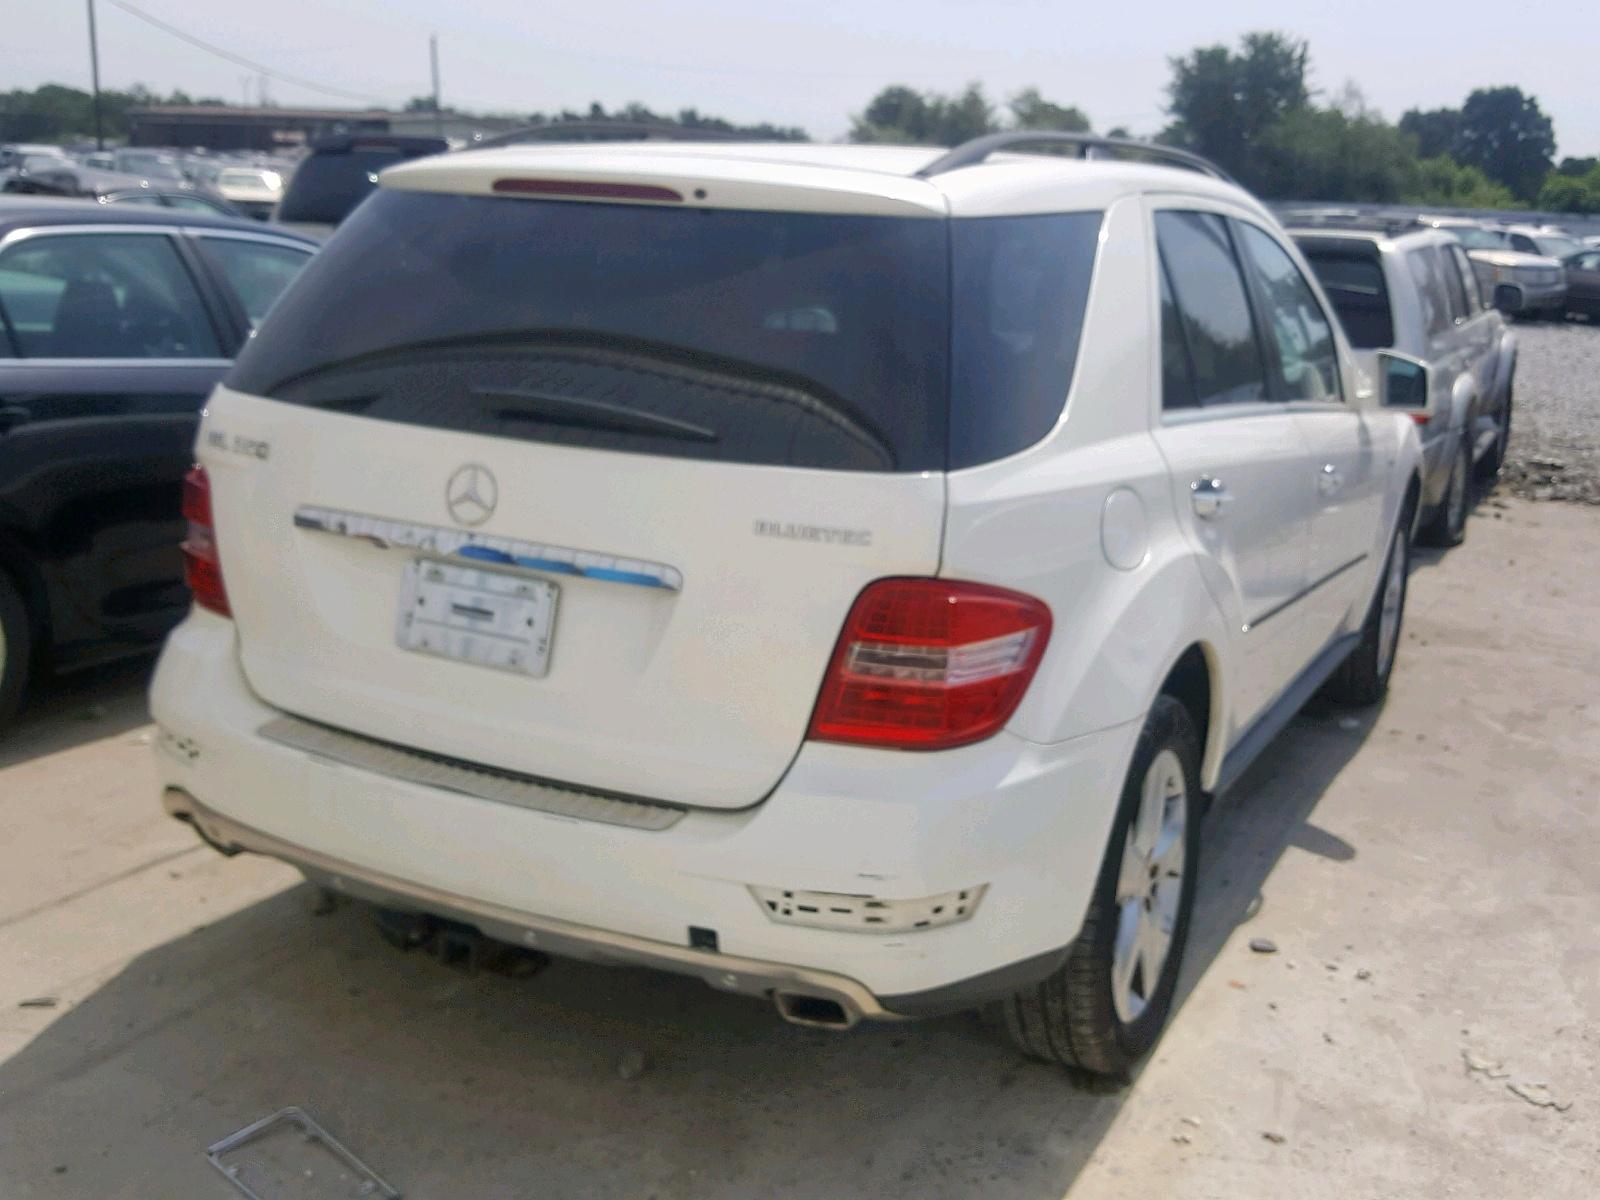 4JGBB2FB0BA648633 - 2011 Mercedes-Benz Ml 350 Blu 3.0L rear view